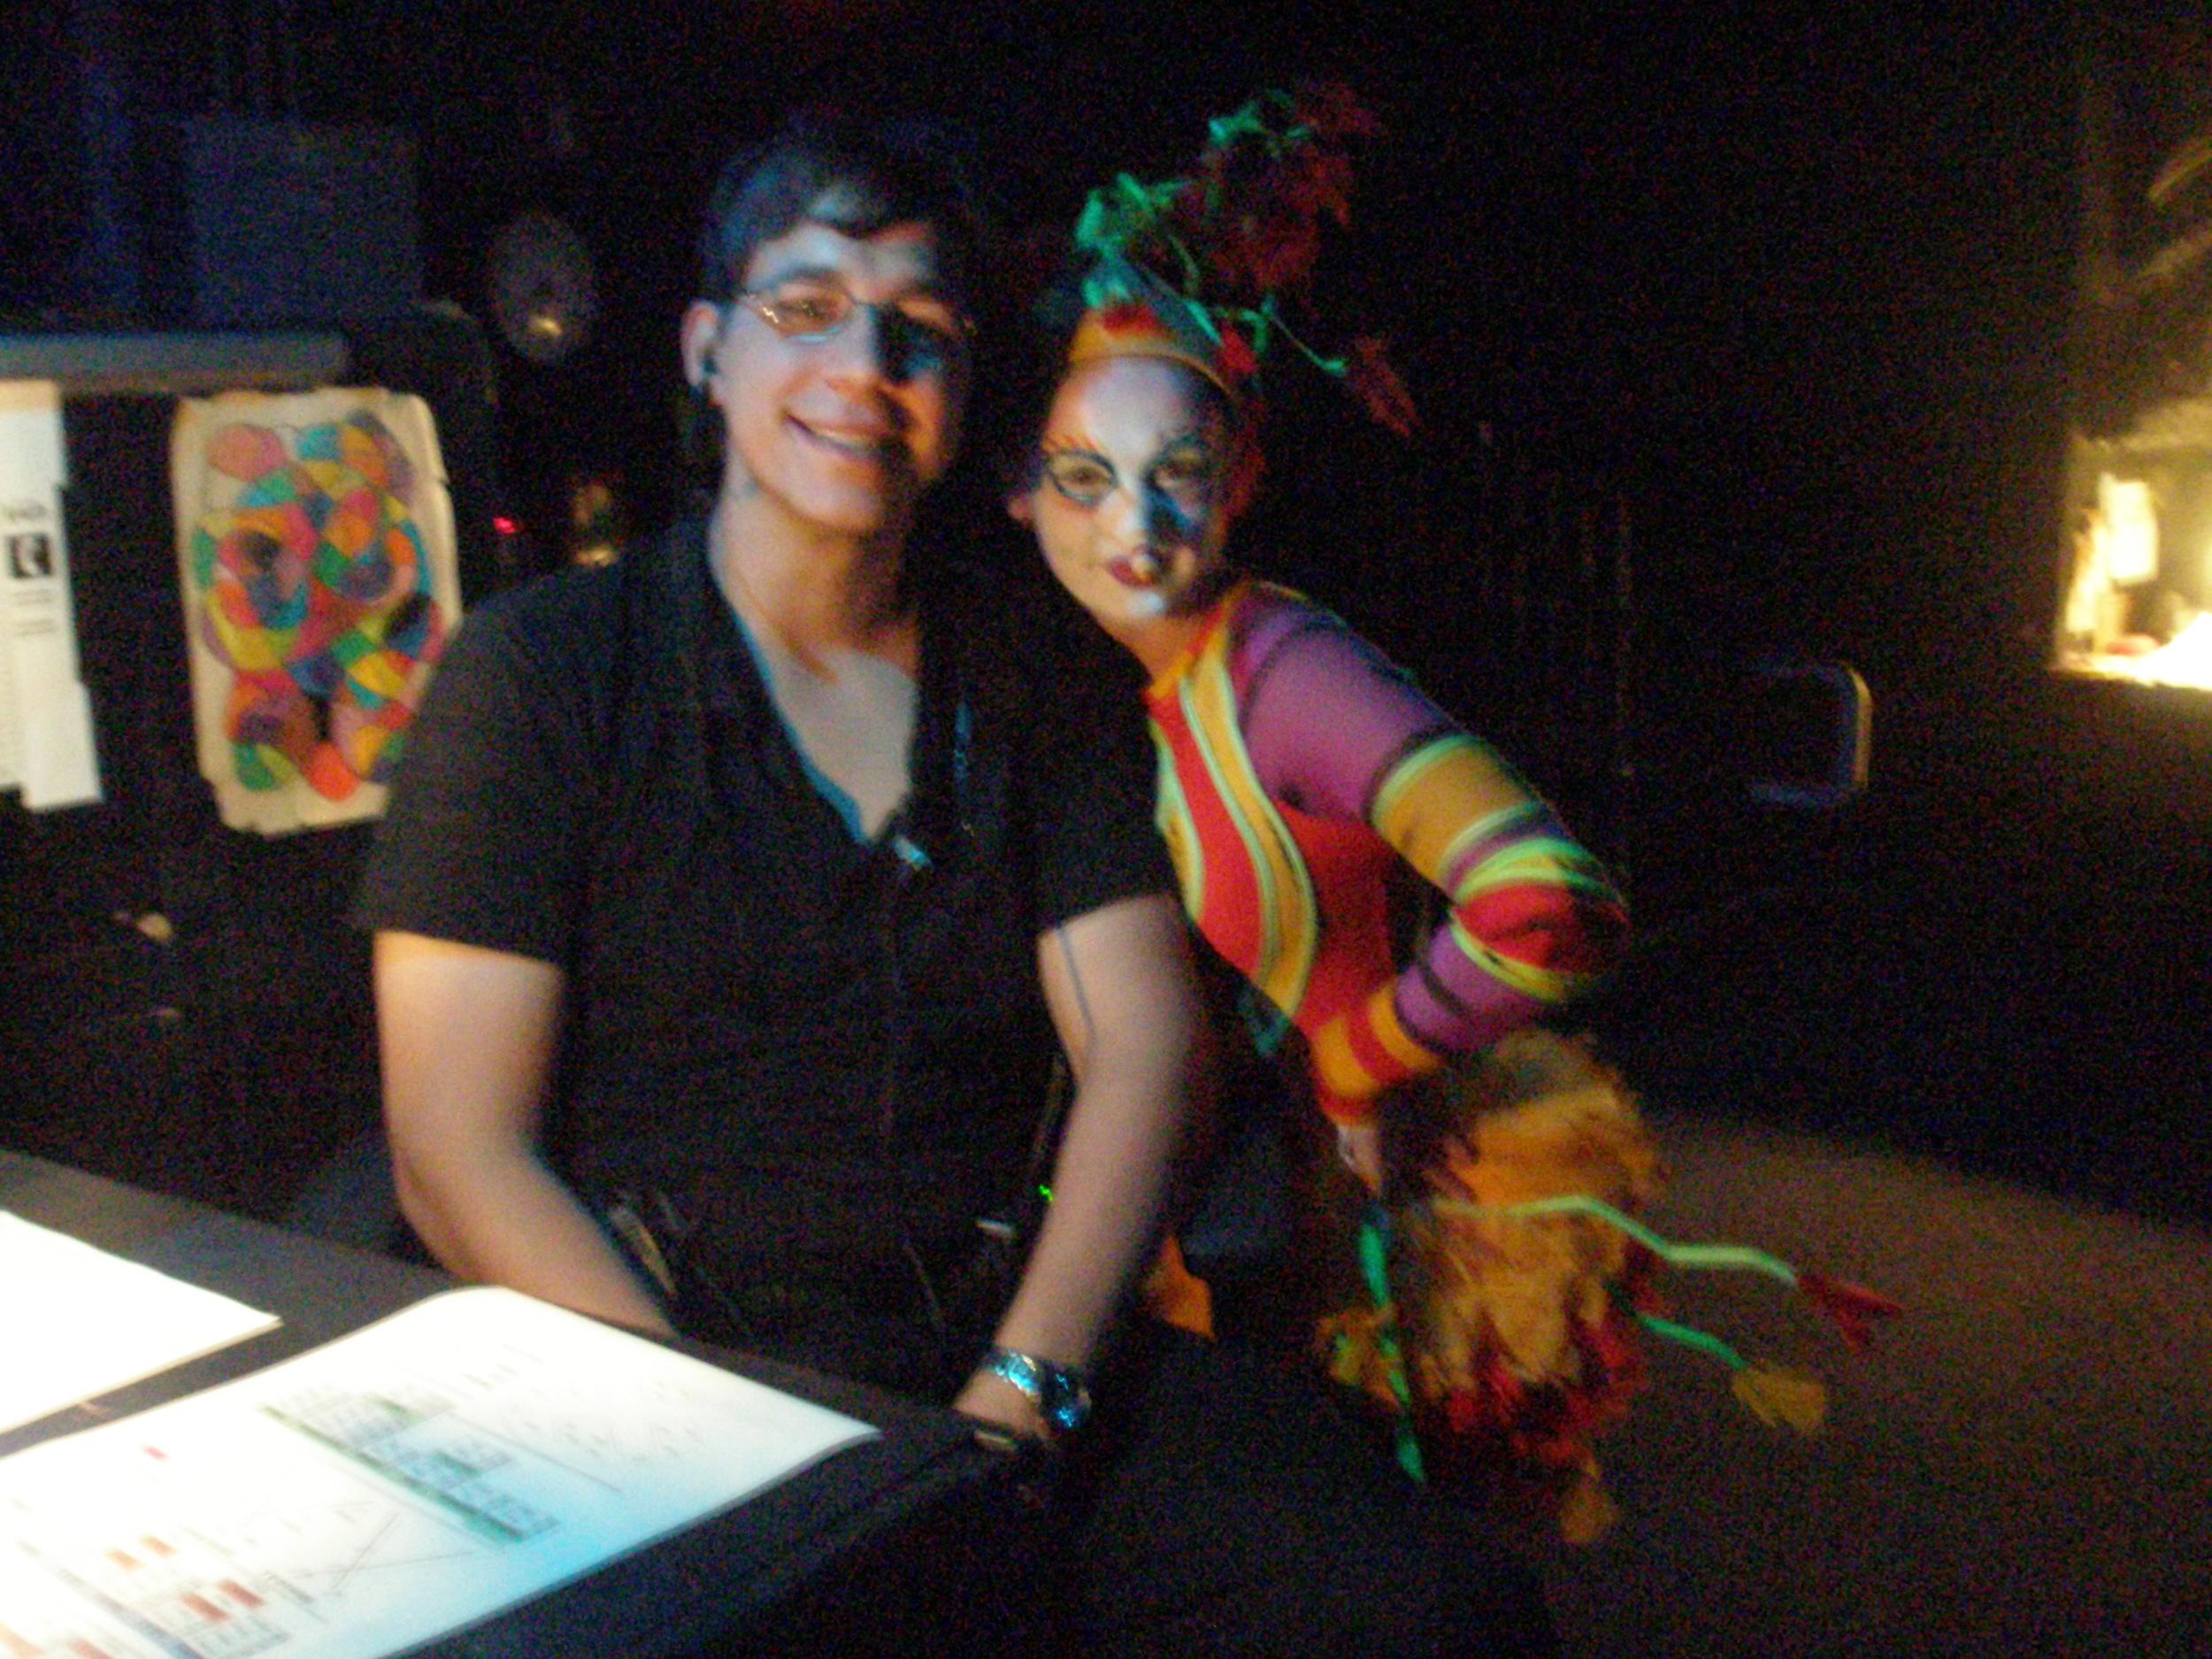 fROM MY LAST NIGHT WORKING AT cIRQUE DU sOLEIL: lA nOUBA.